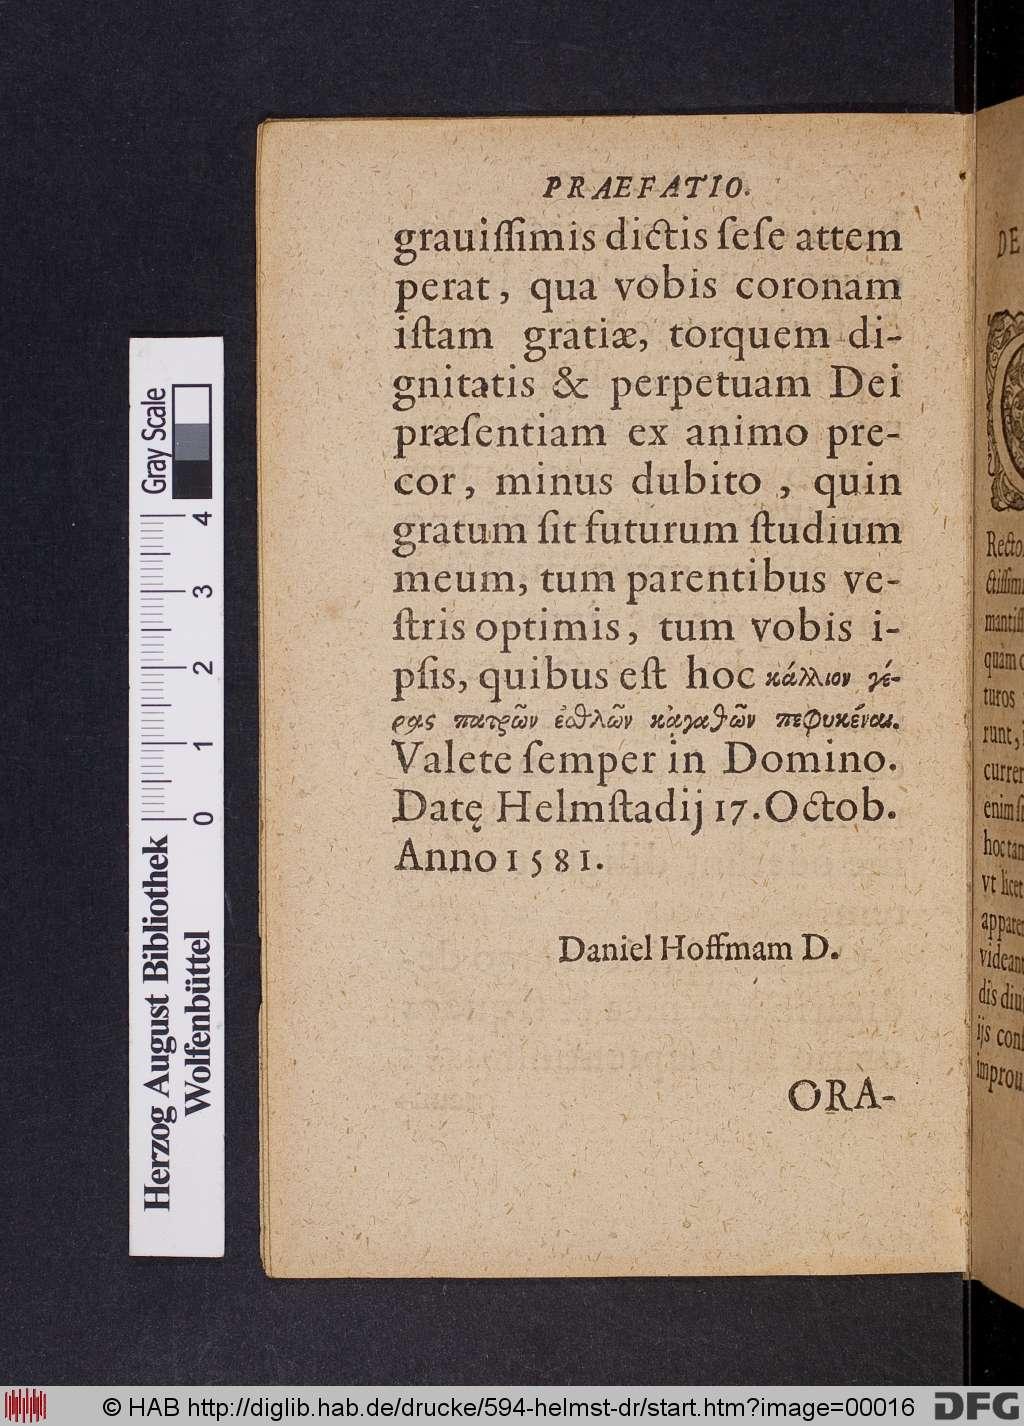 https://diglib.hab.de/drucke/594-helmst-dr/00016.jpg